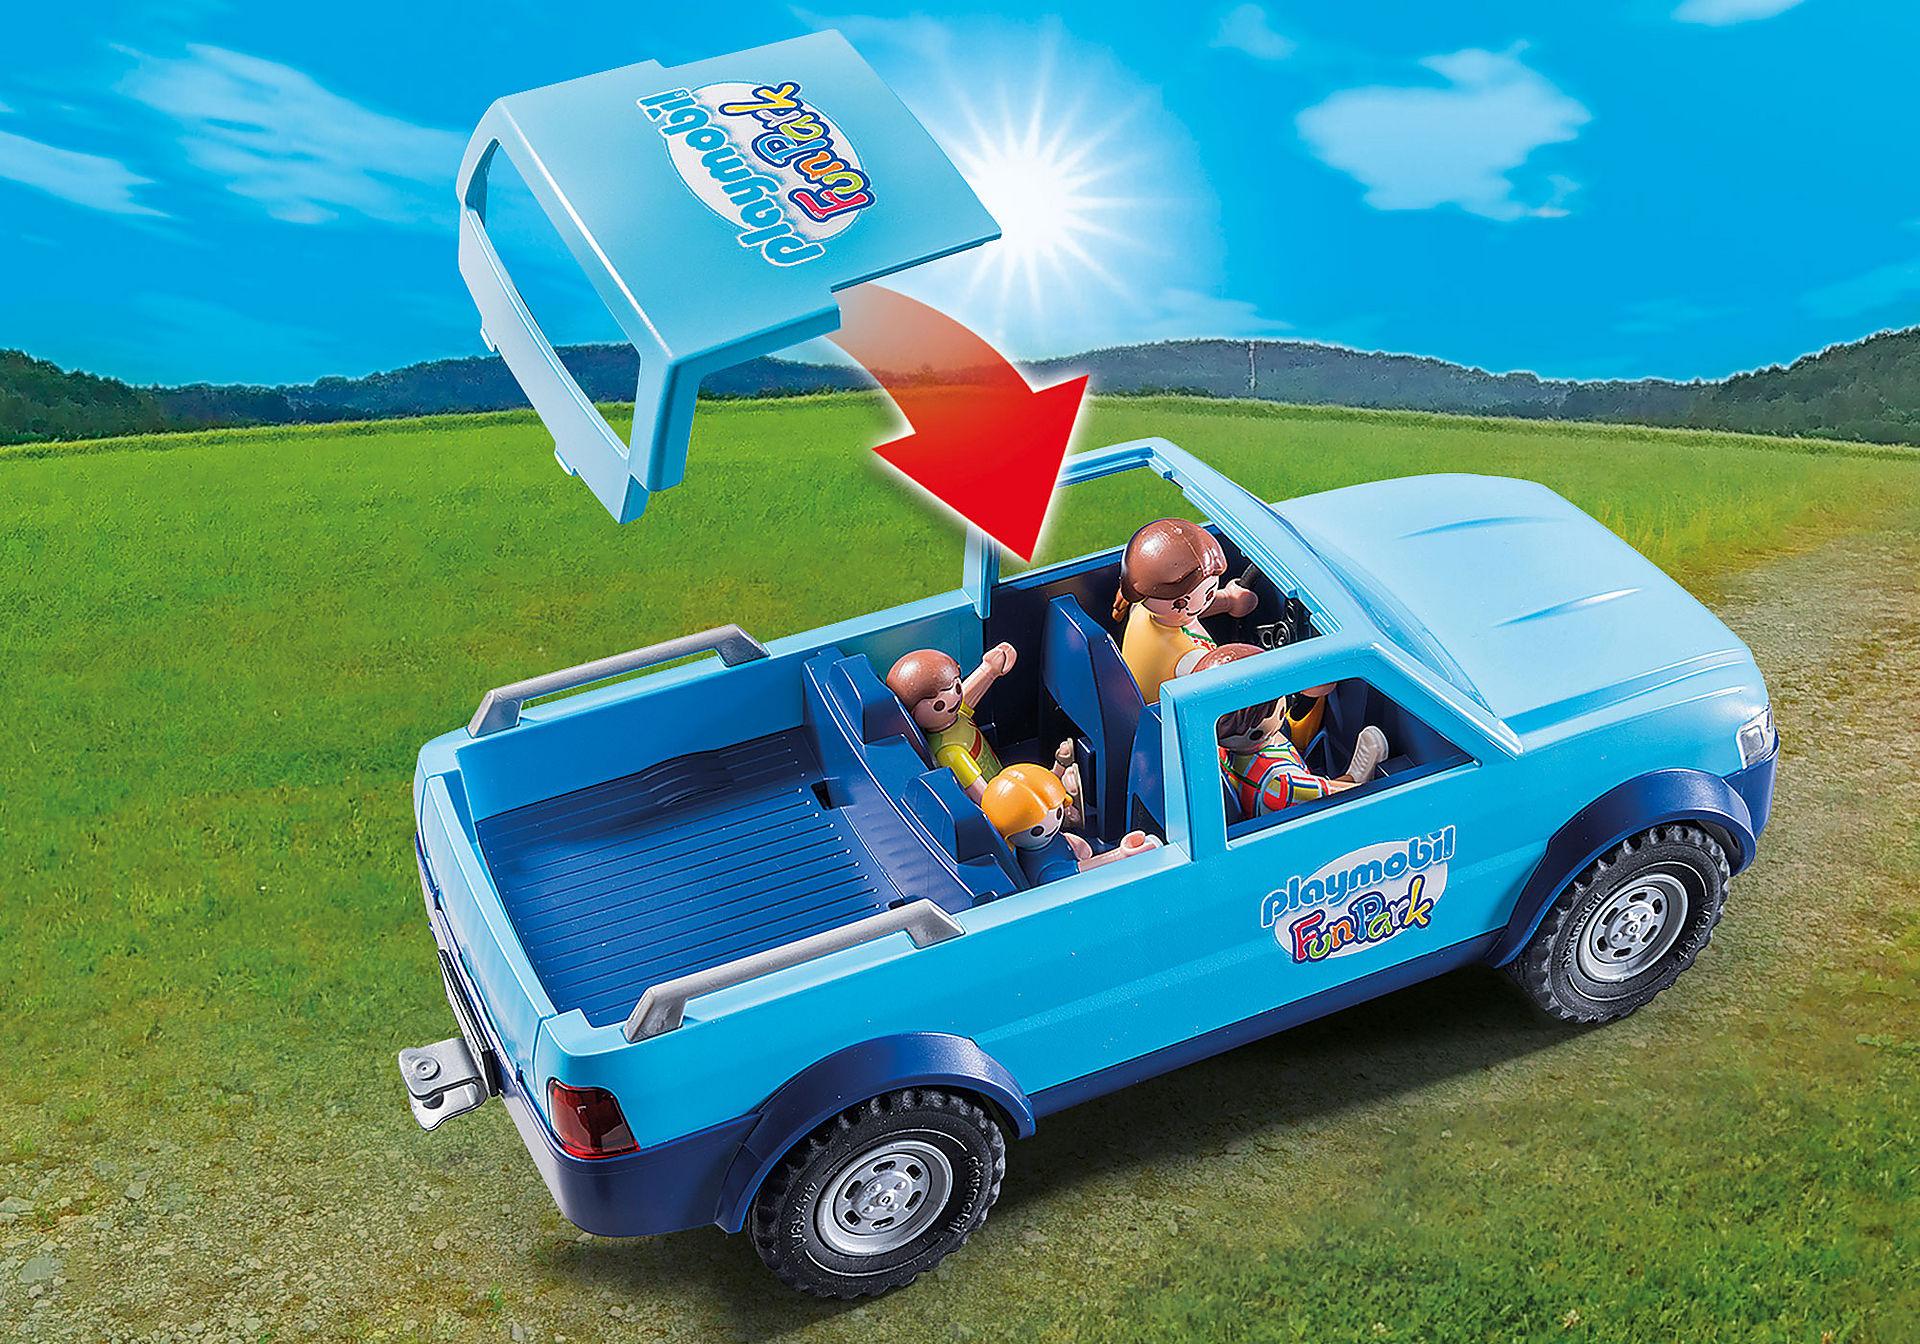 9502 PLAYMOBIL-FunPark Pickup met caravan zoom image4